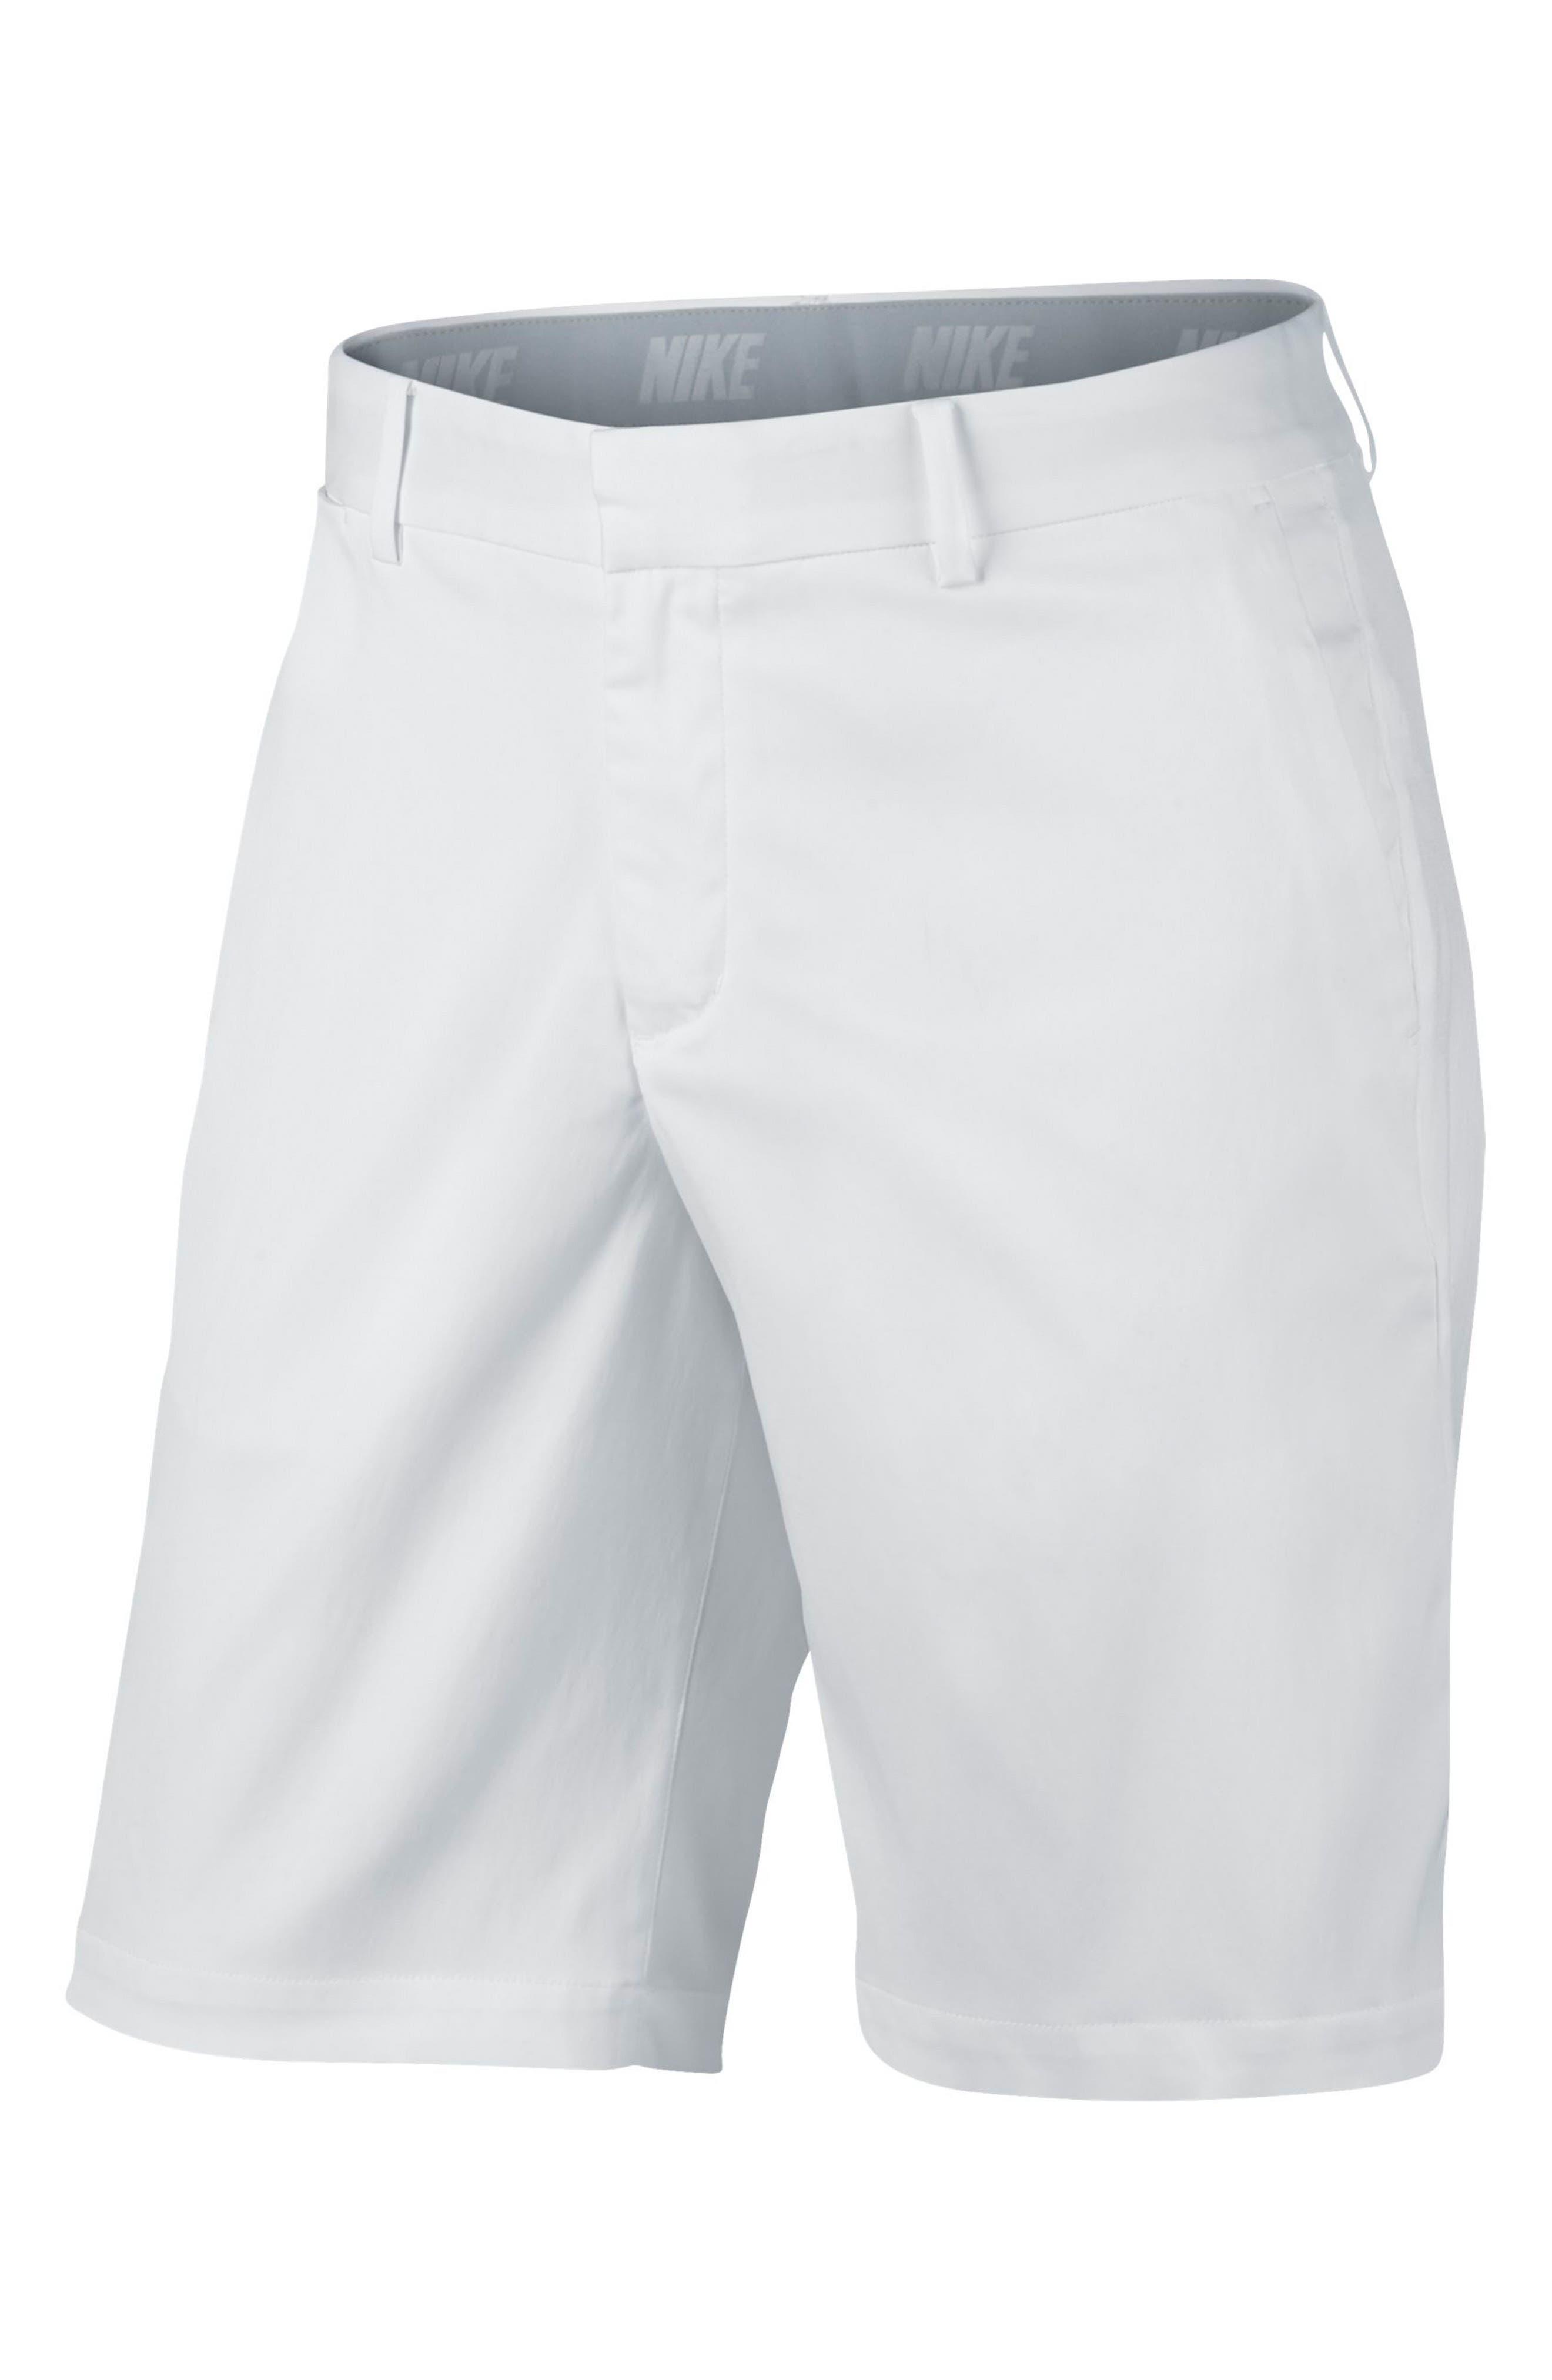 Flat Front Golf Shorts,                             Alternate thumbnail 48, color,